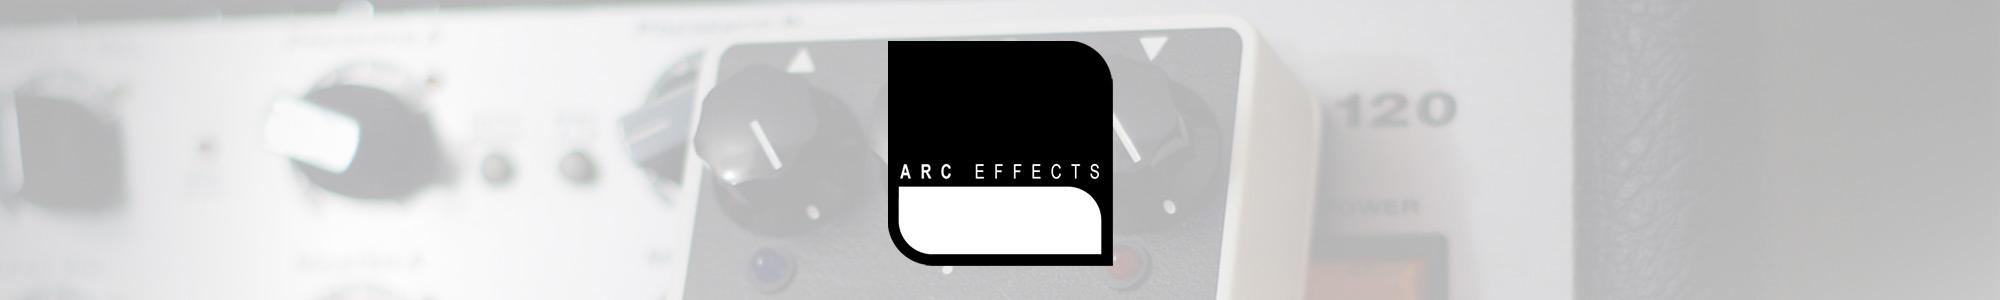 Arc Effects